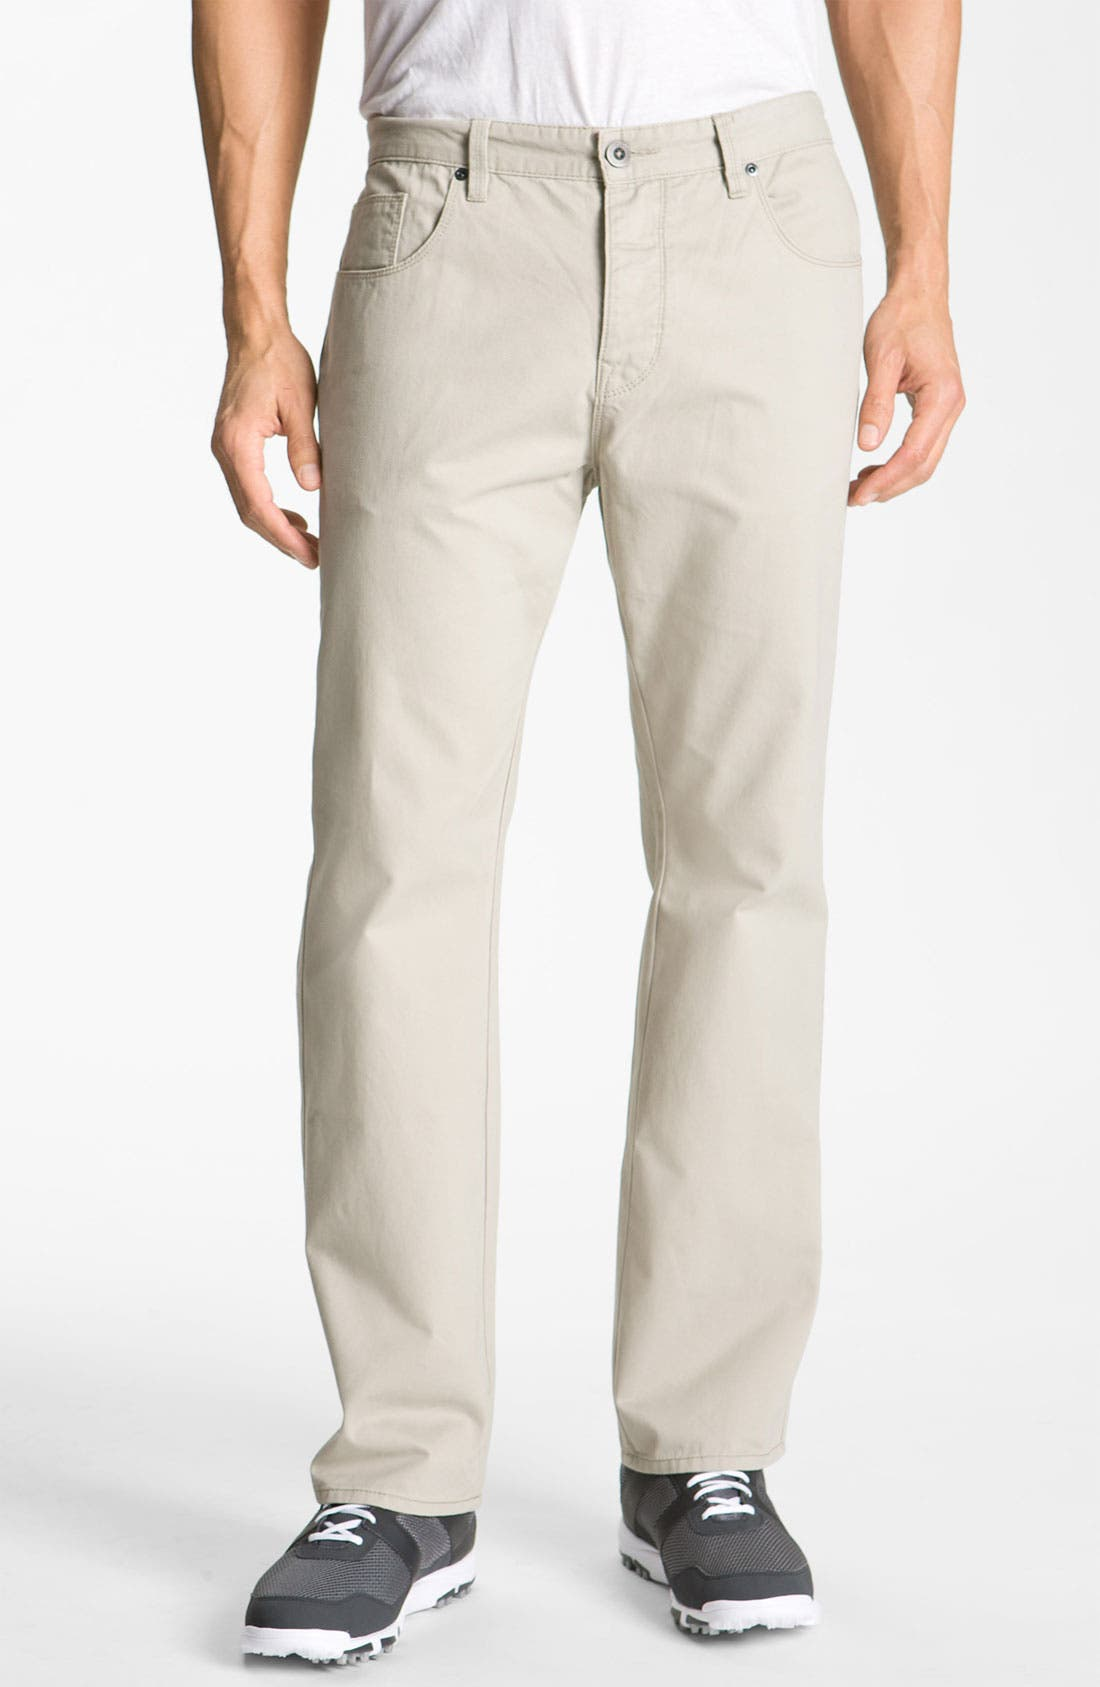 Main Image - Cutter & Buck 'Pike' Five-Pocket Pants (Big & Tall)